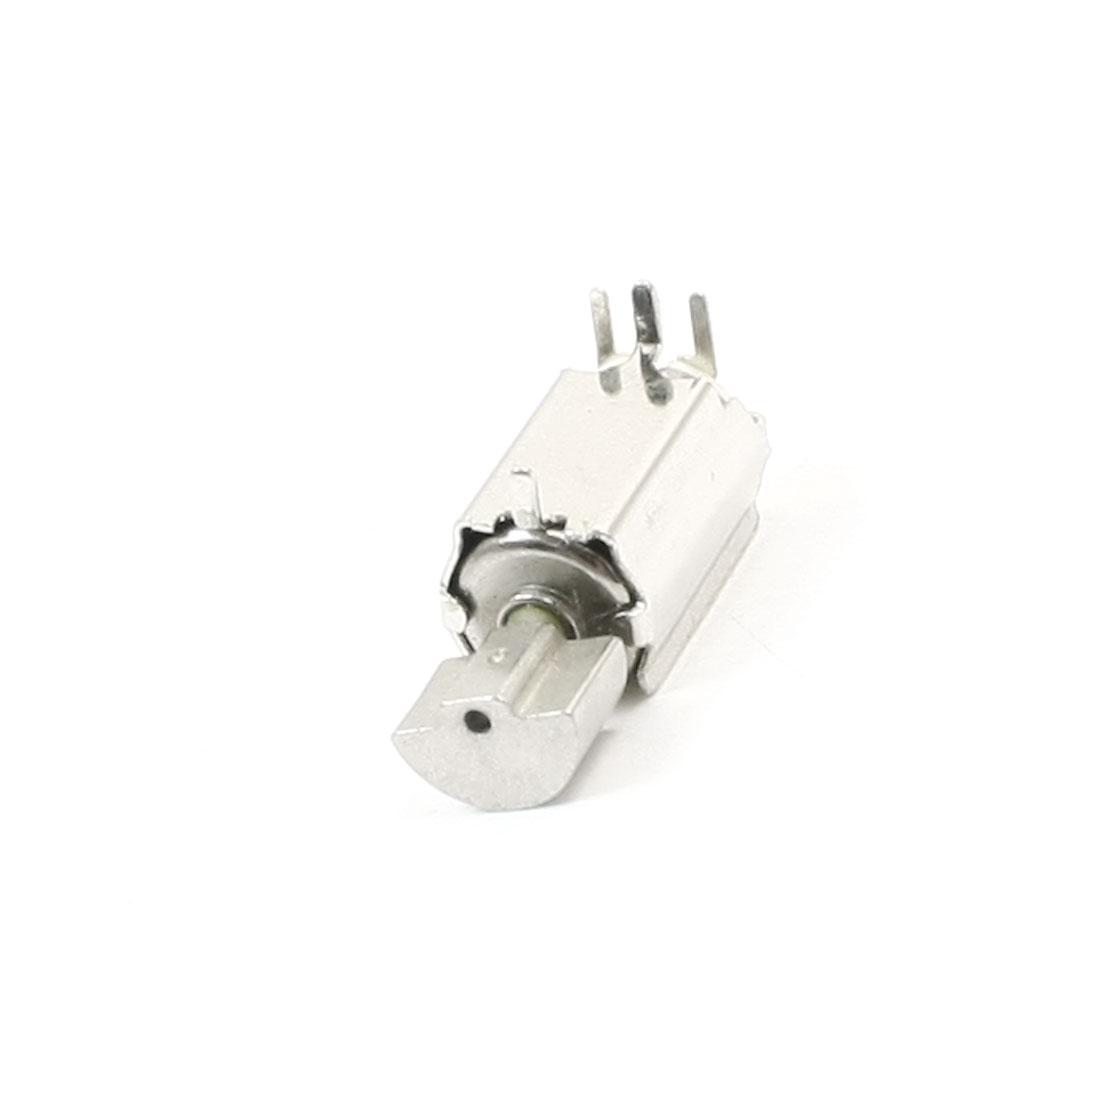 10000RPM-Speed-DC-3V-6mm-x-10mm-Micro-Coreless-Vibration-Motor